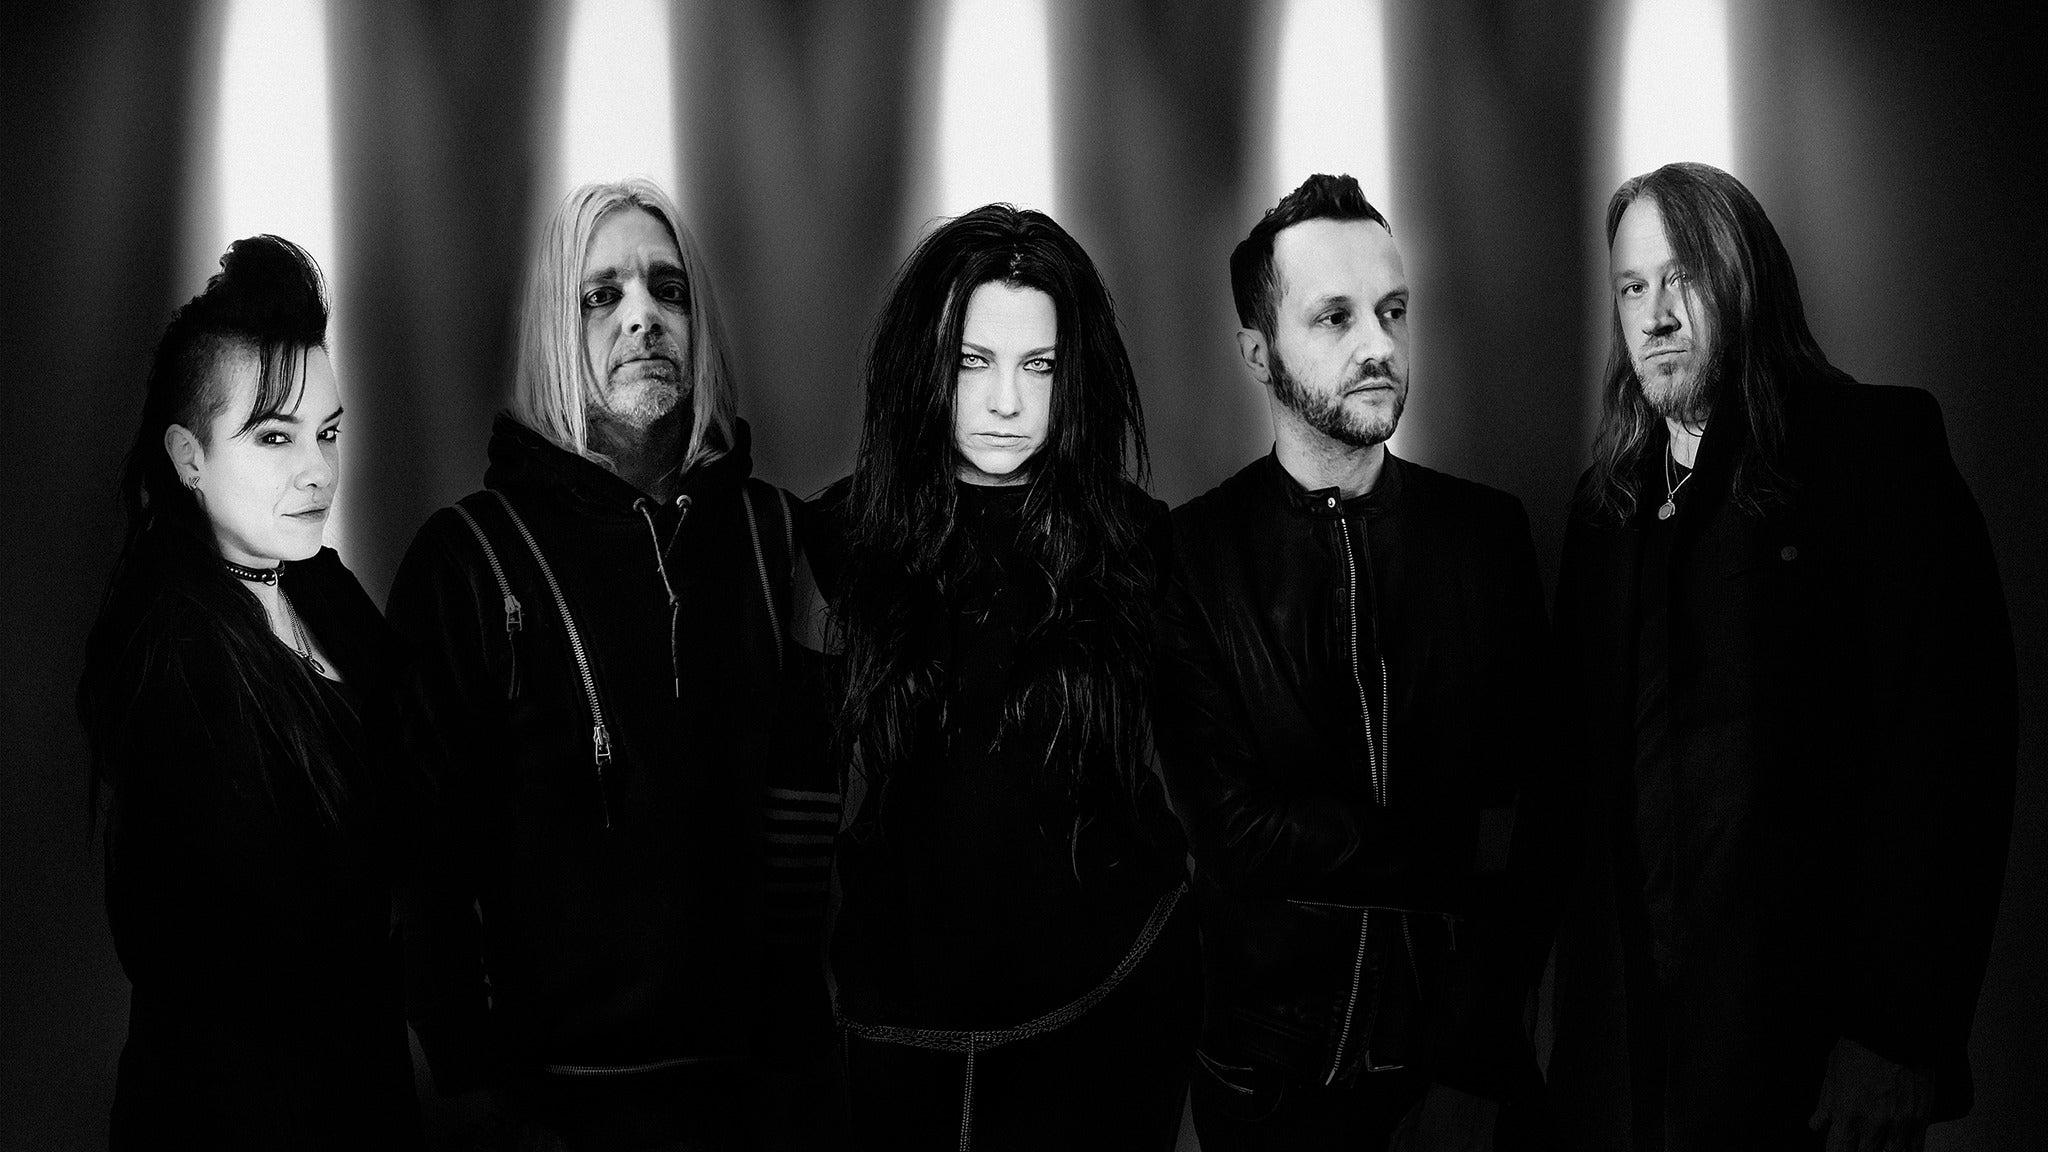 Evanescence + Halestorm at Prudential Center - Newark, NJ 07102